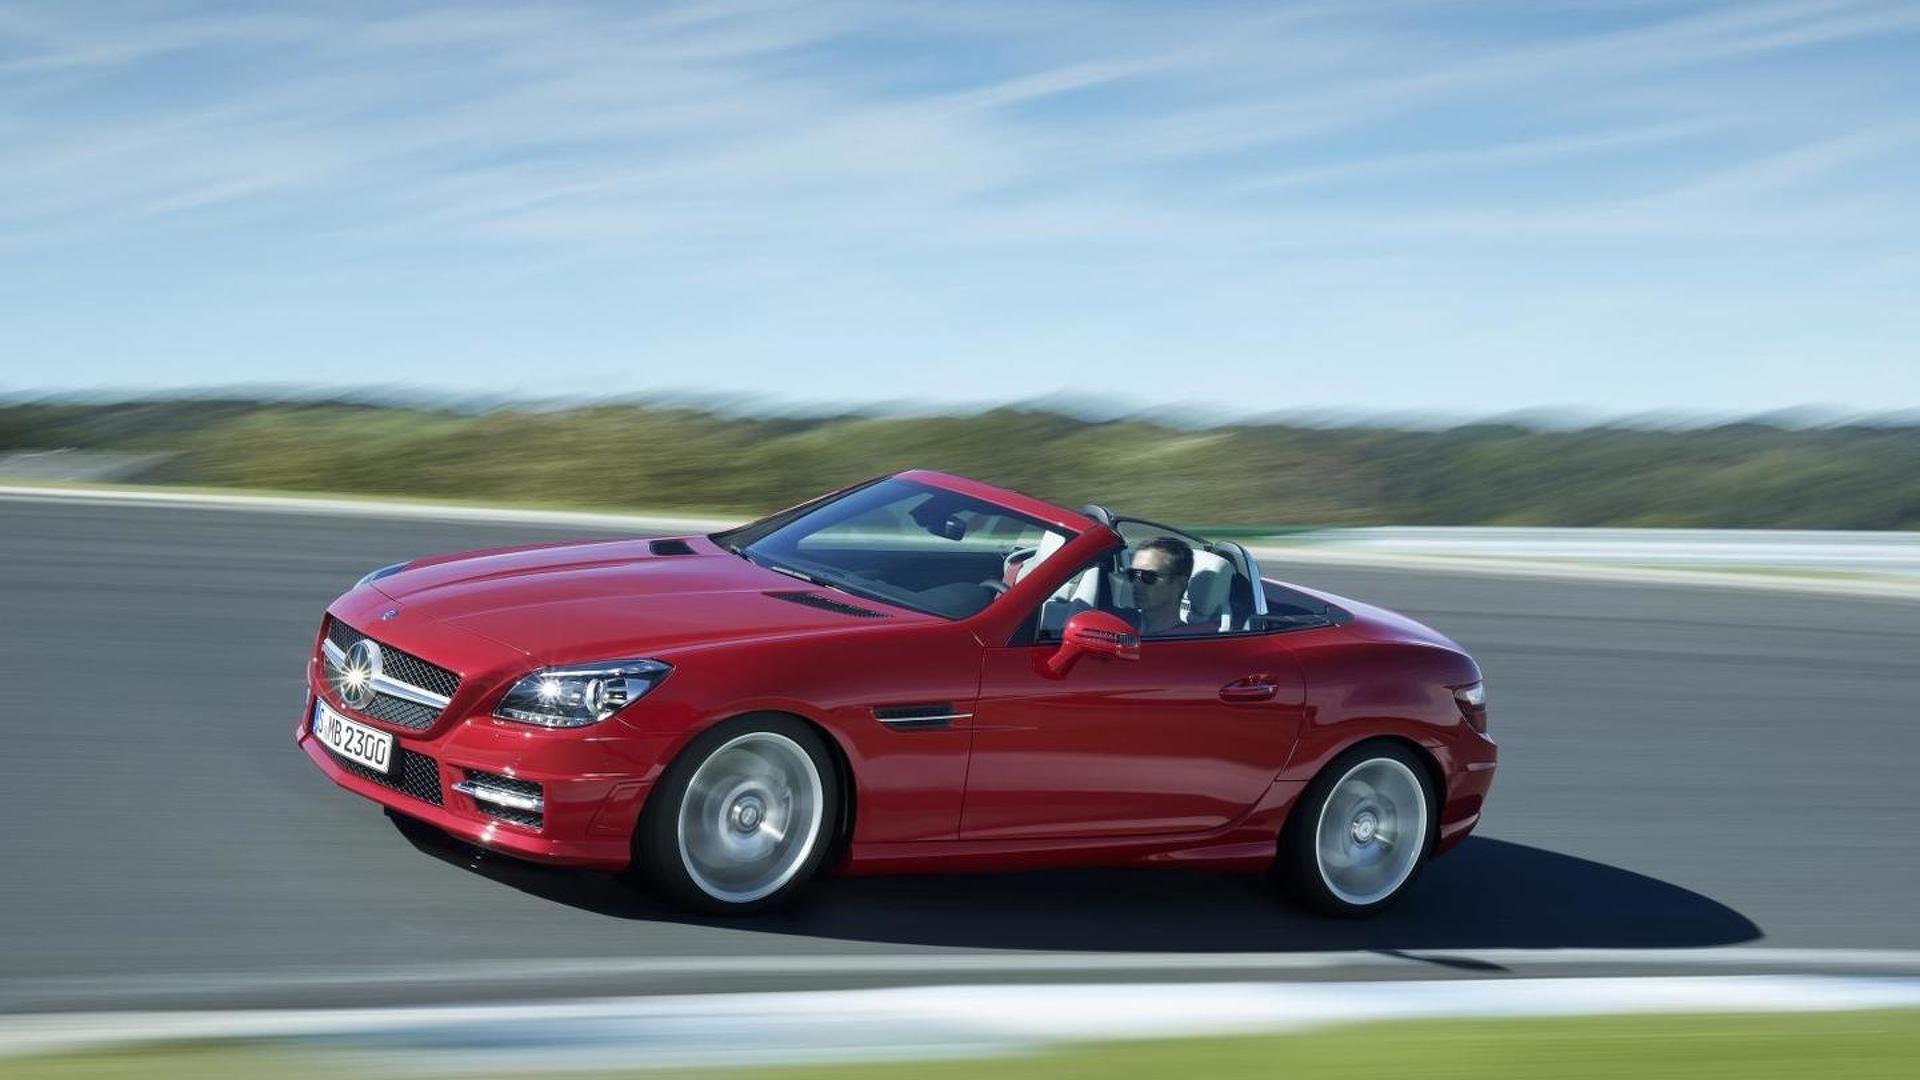 Mercedes Benz Slk Class News And Reviews Motor1 Com Mercedes